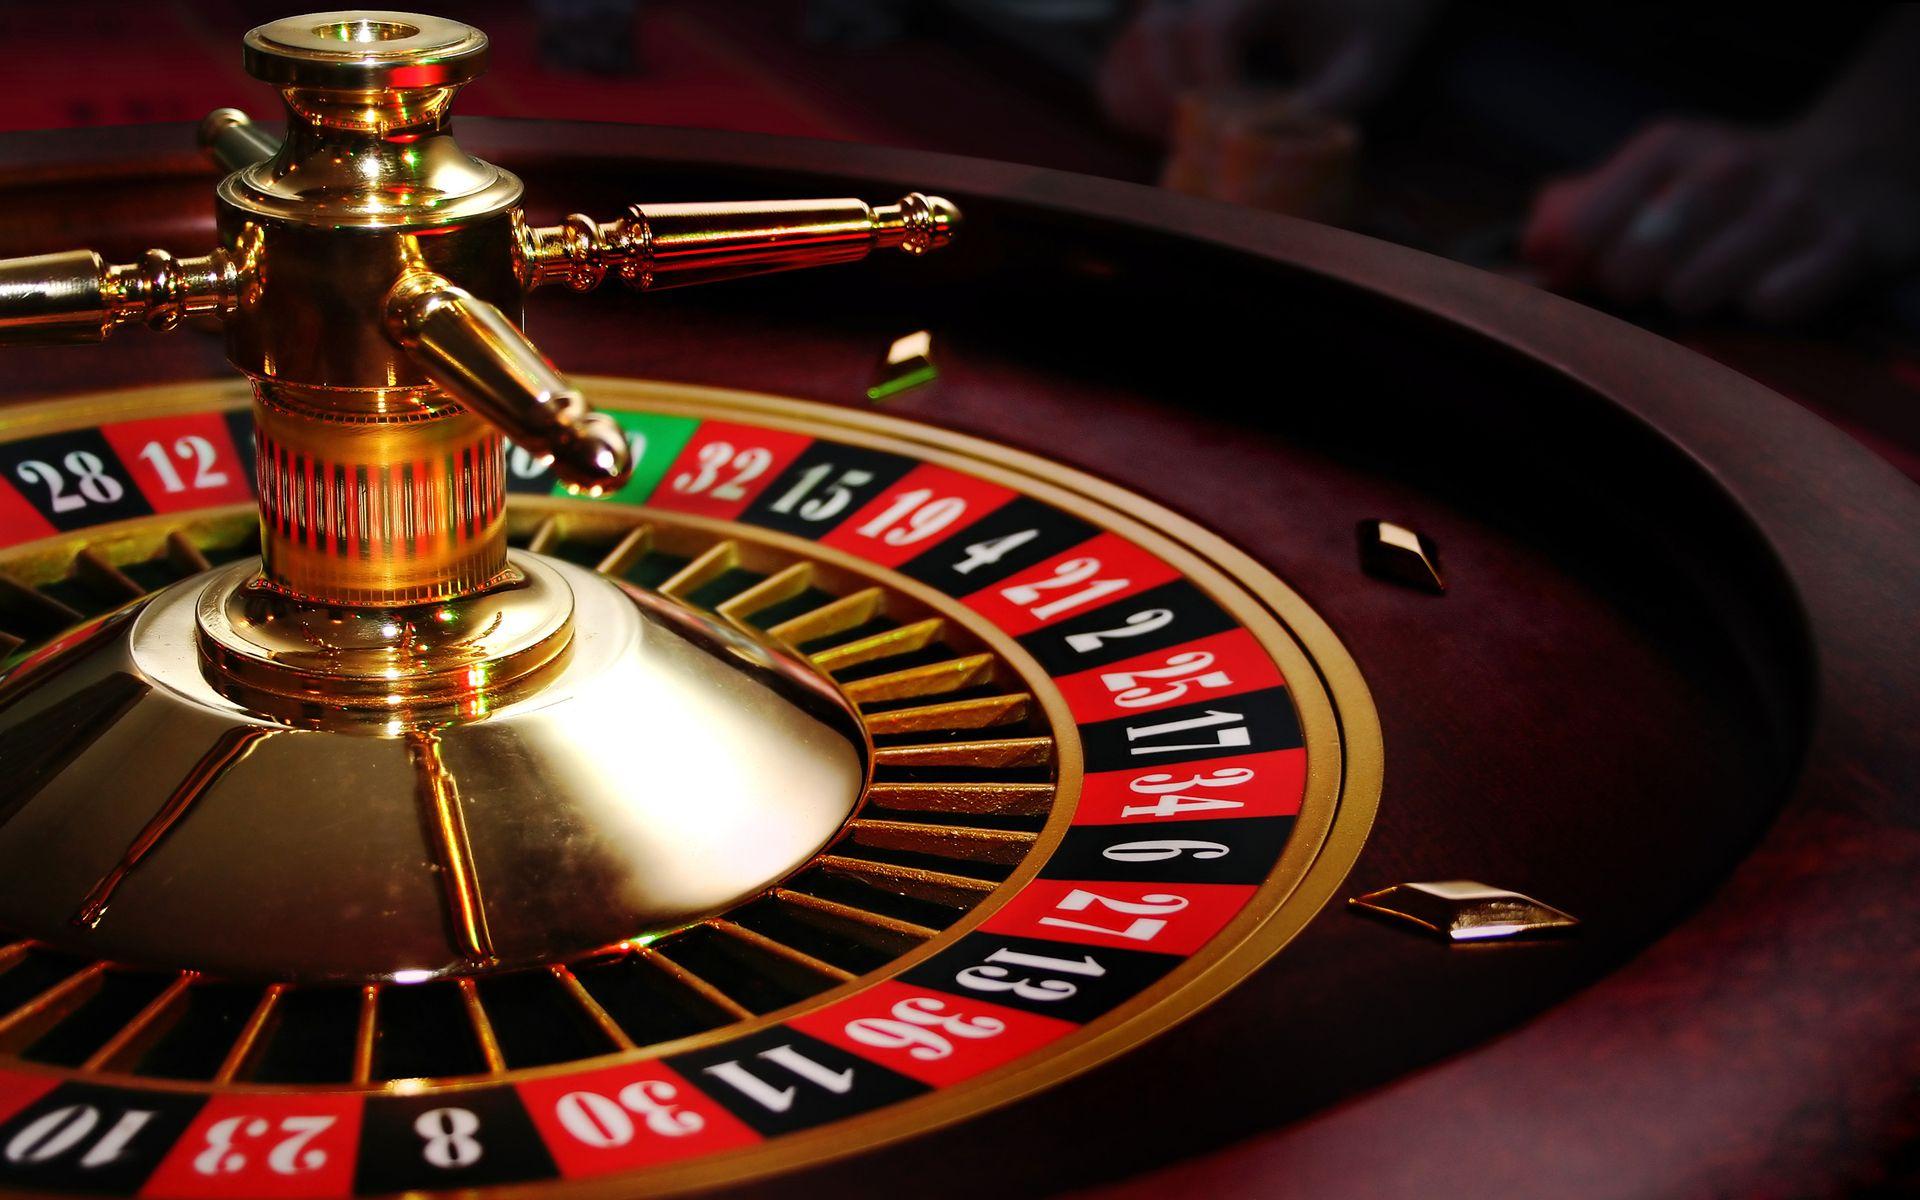 Jeux casino : la tendance qui ravie